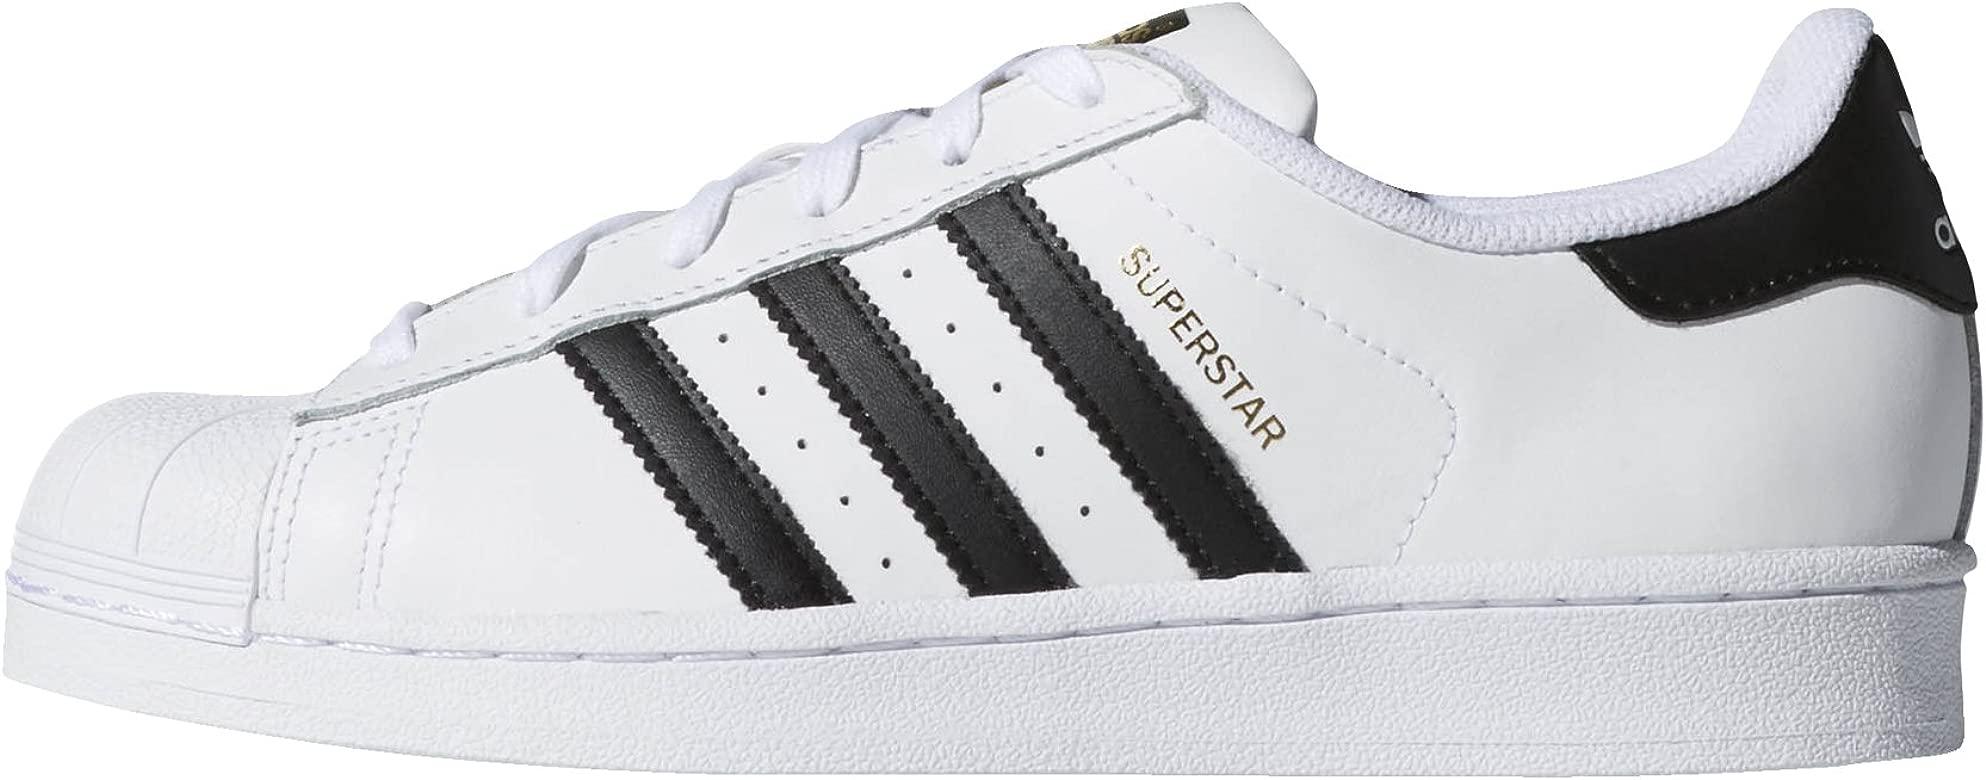 2183 Best adidas shoes images | Adidas shoes, Adidas women